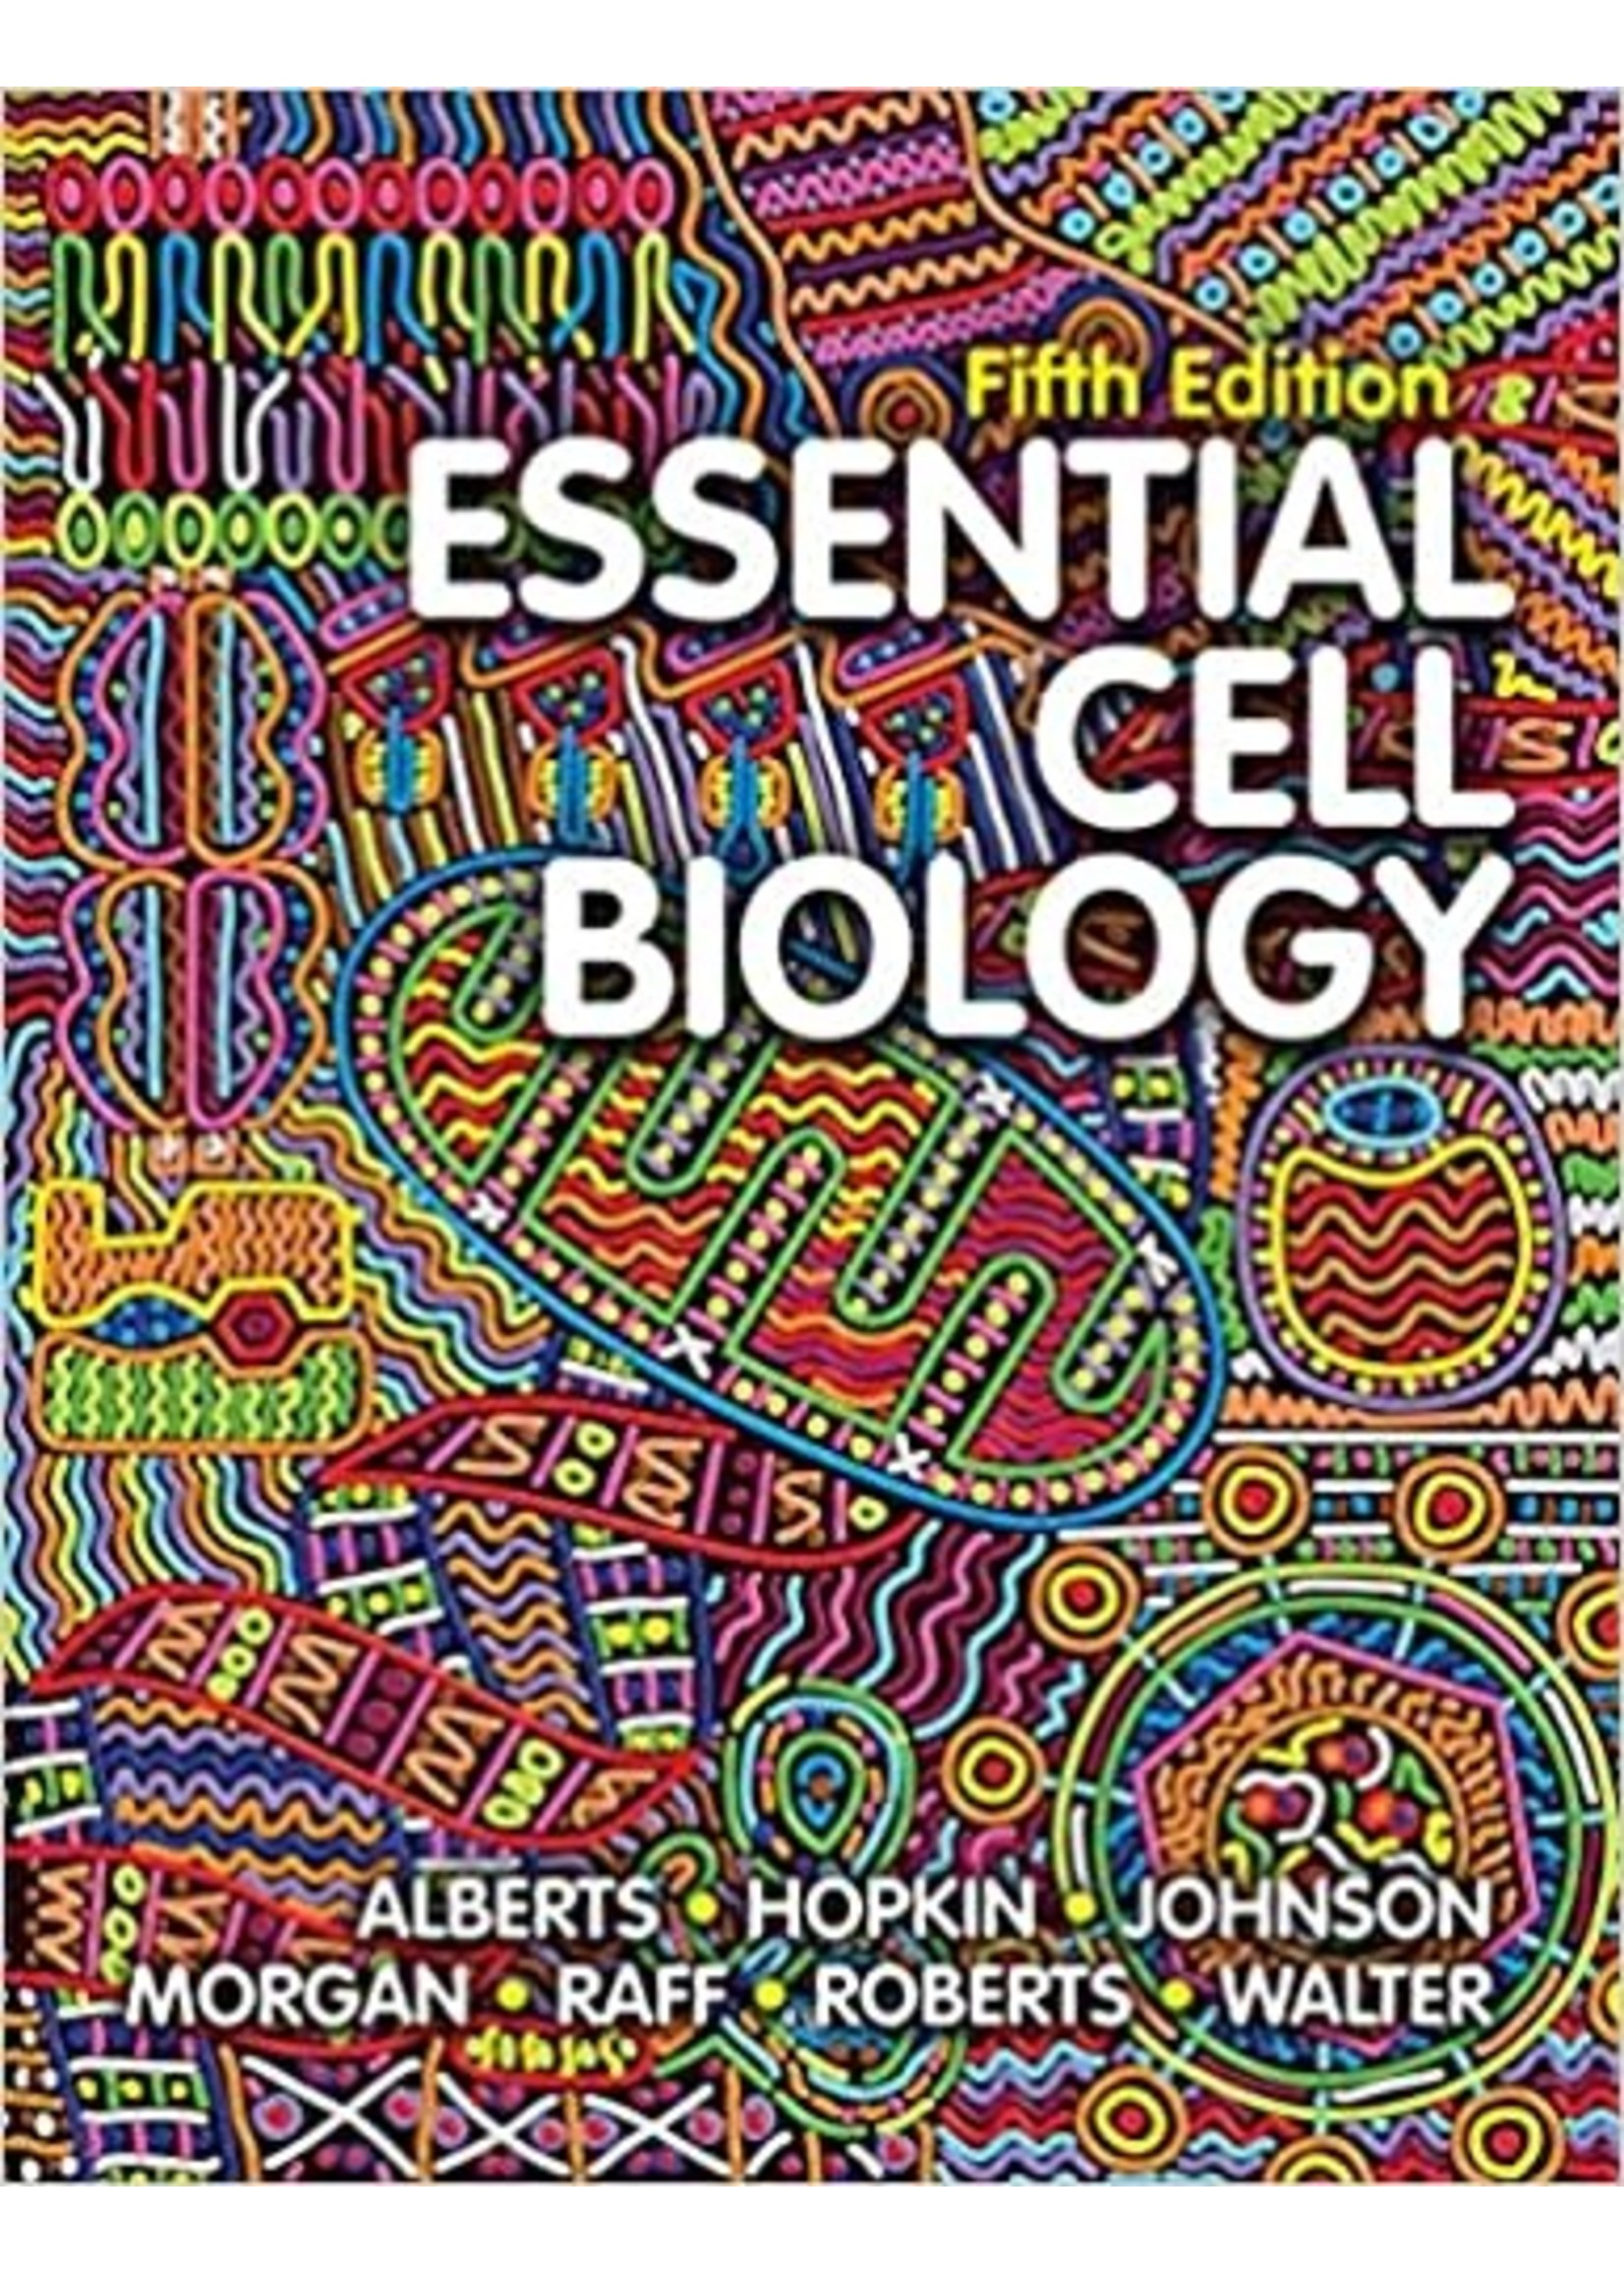 BIO307  ESSENTIAL CELL BIOLOGY